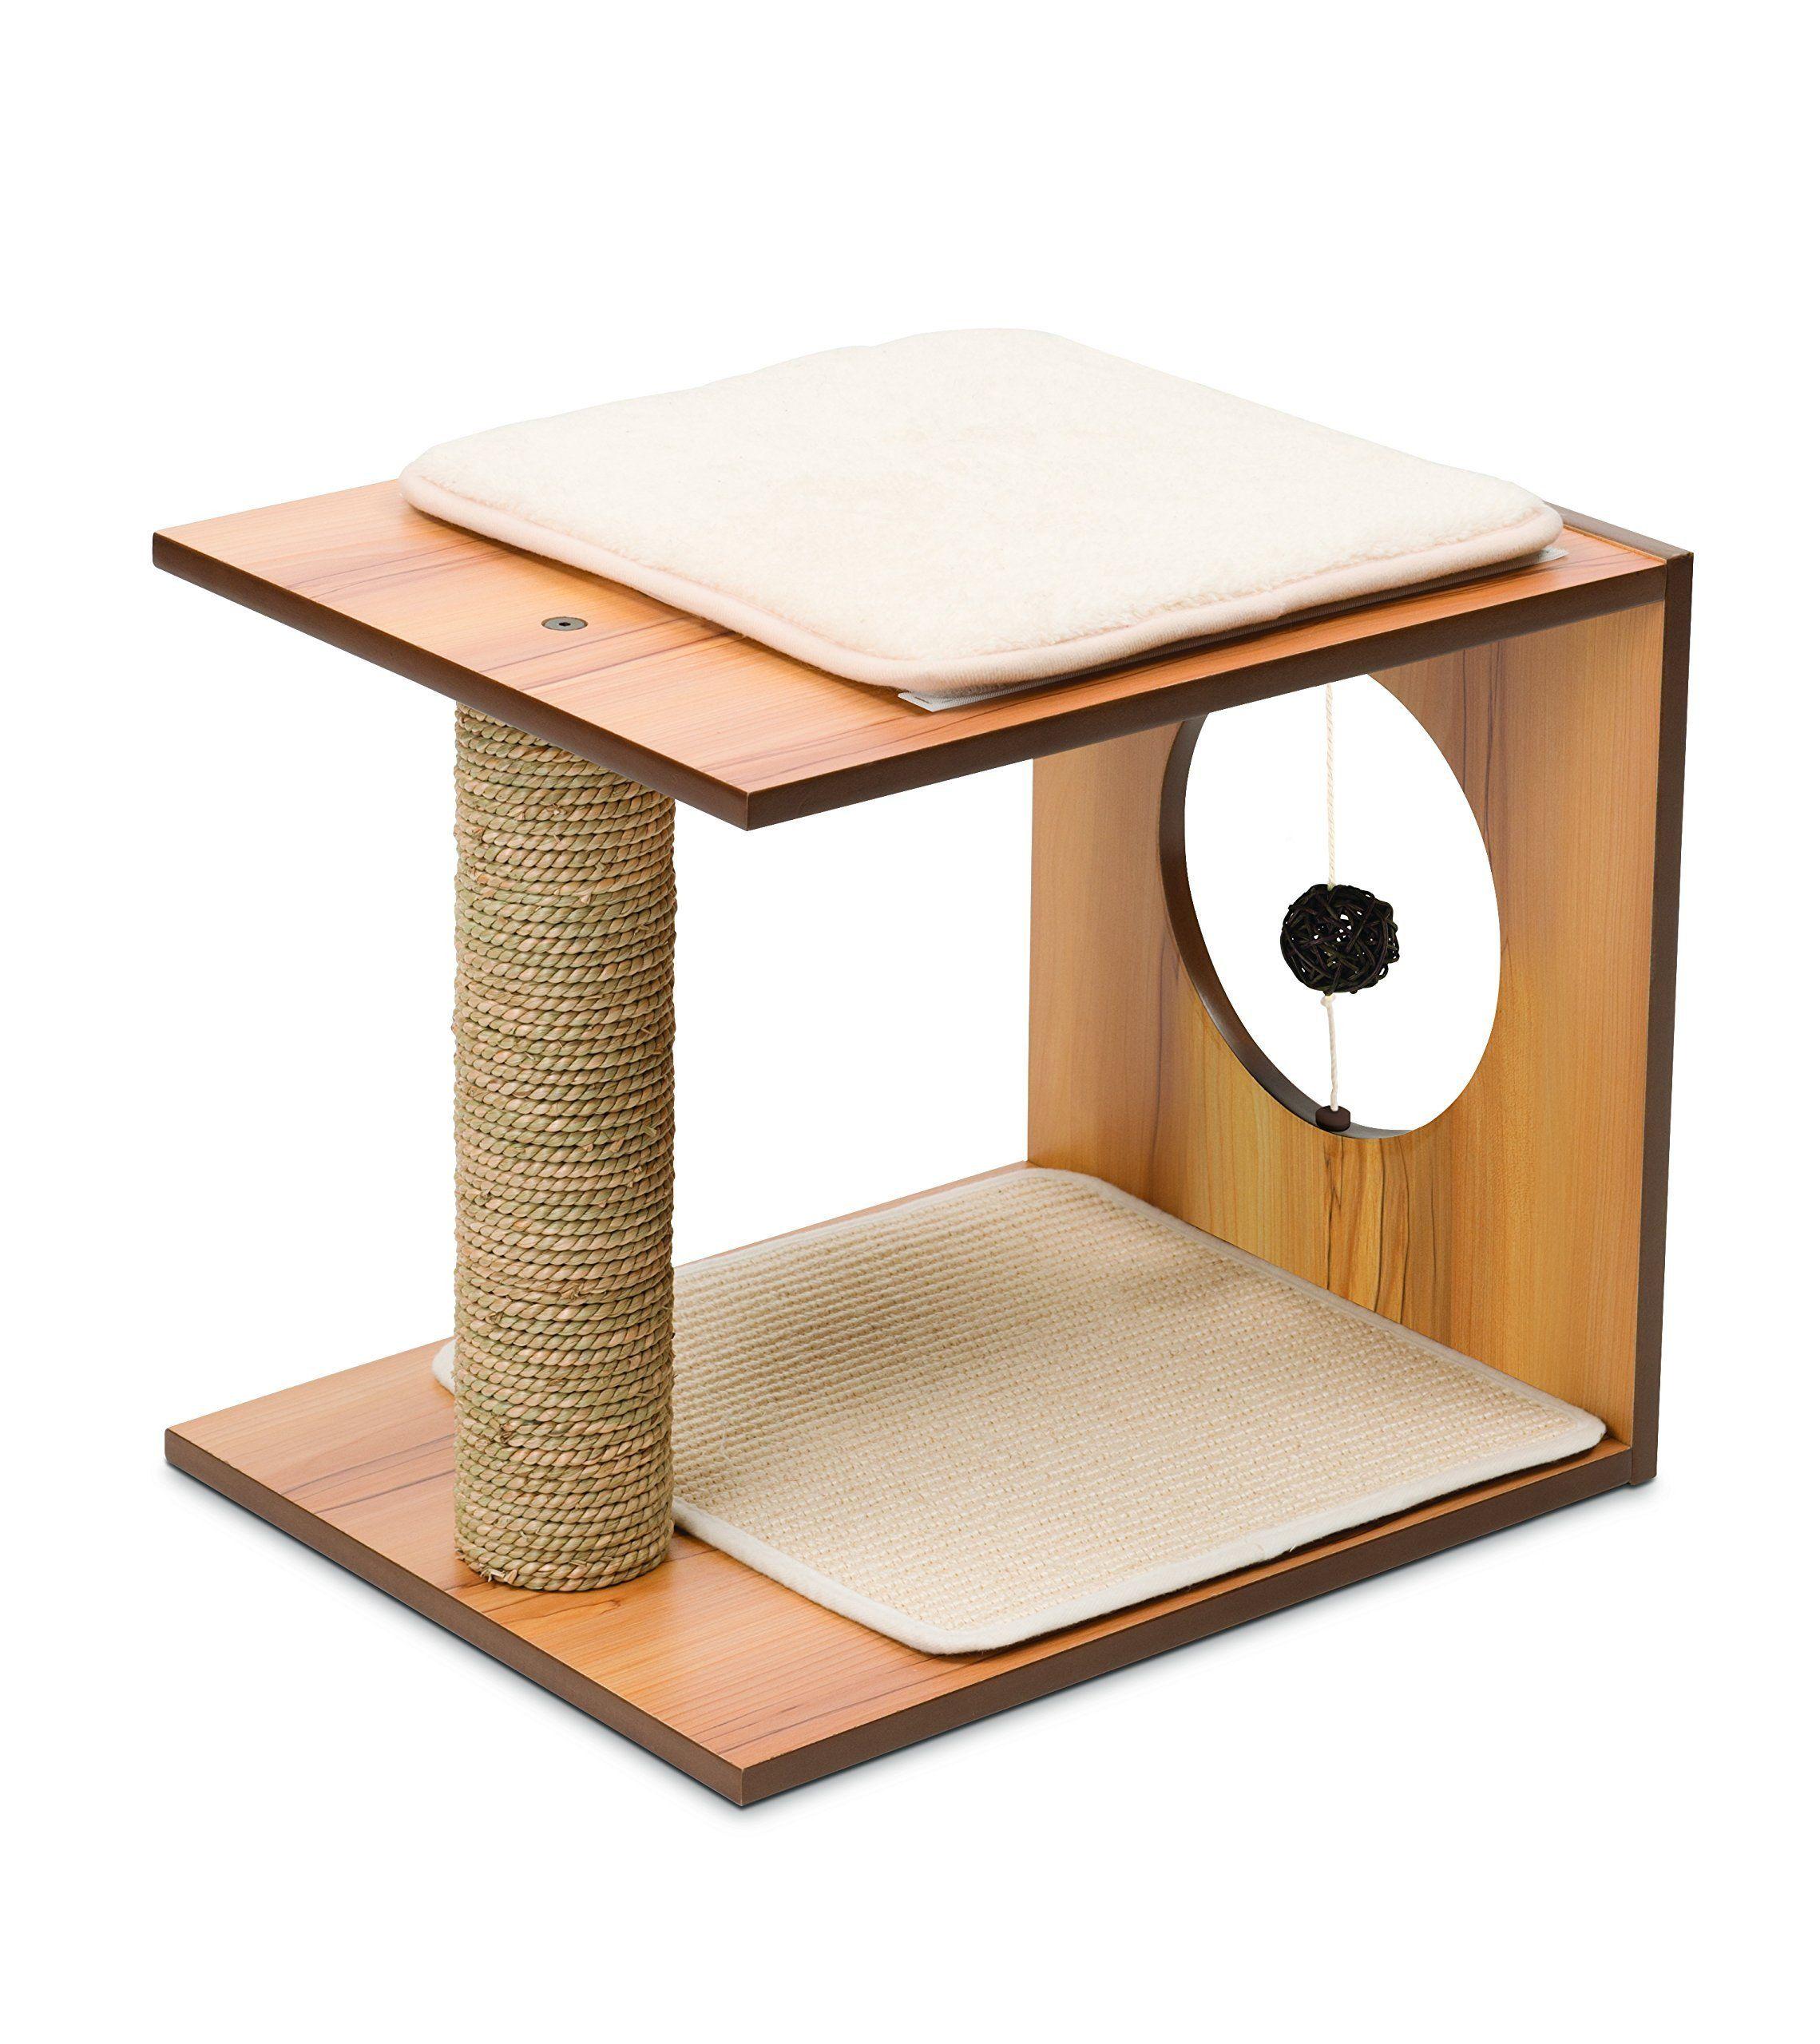 Vesper VStool Walnut Stool, Play furniture, Cat scratcher